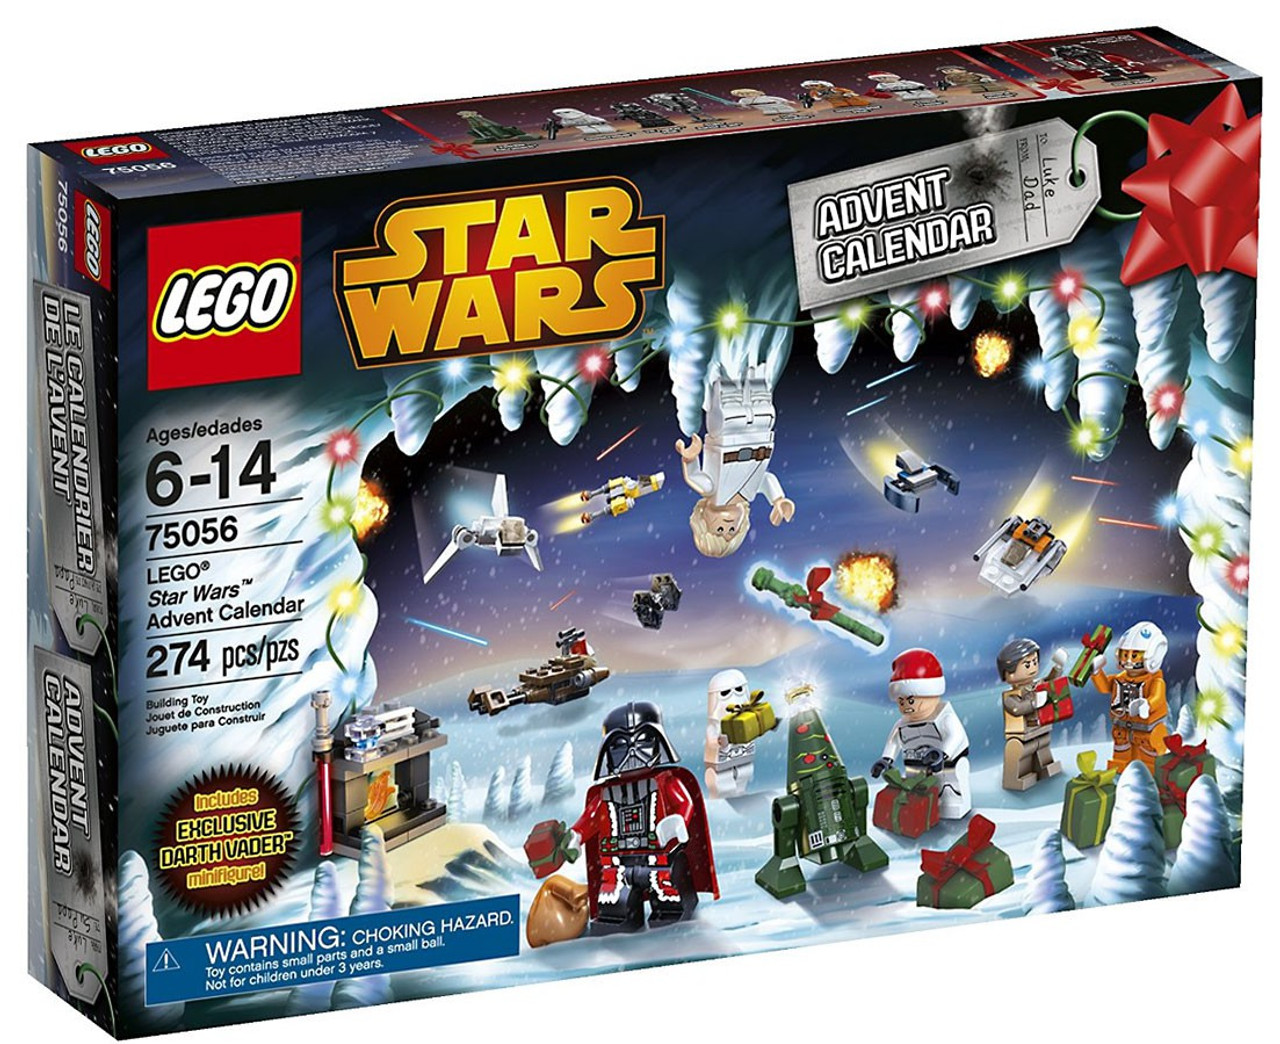 LEGO Star Wars 2018 Advent Calendar Set #75213